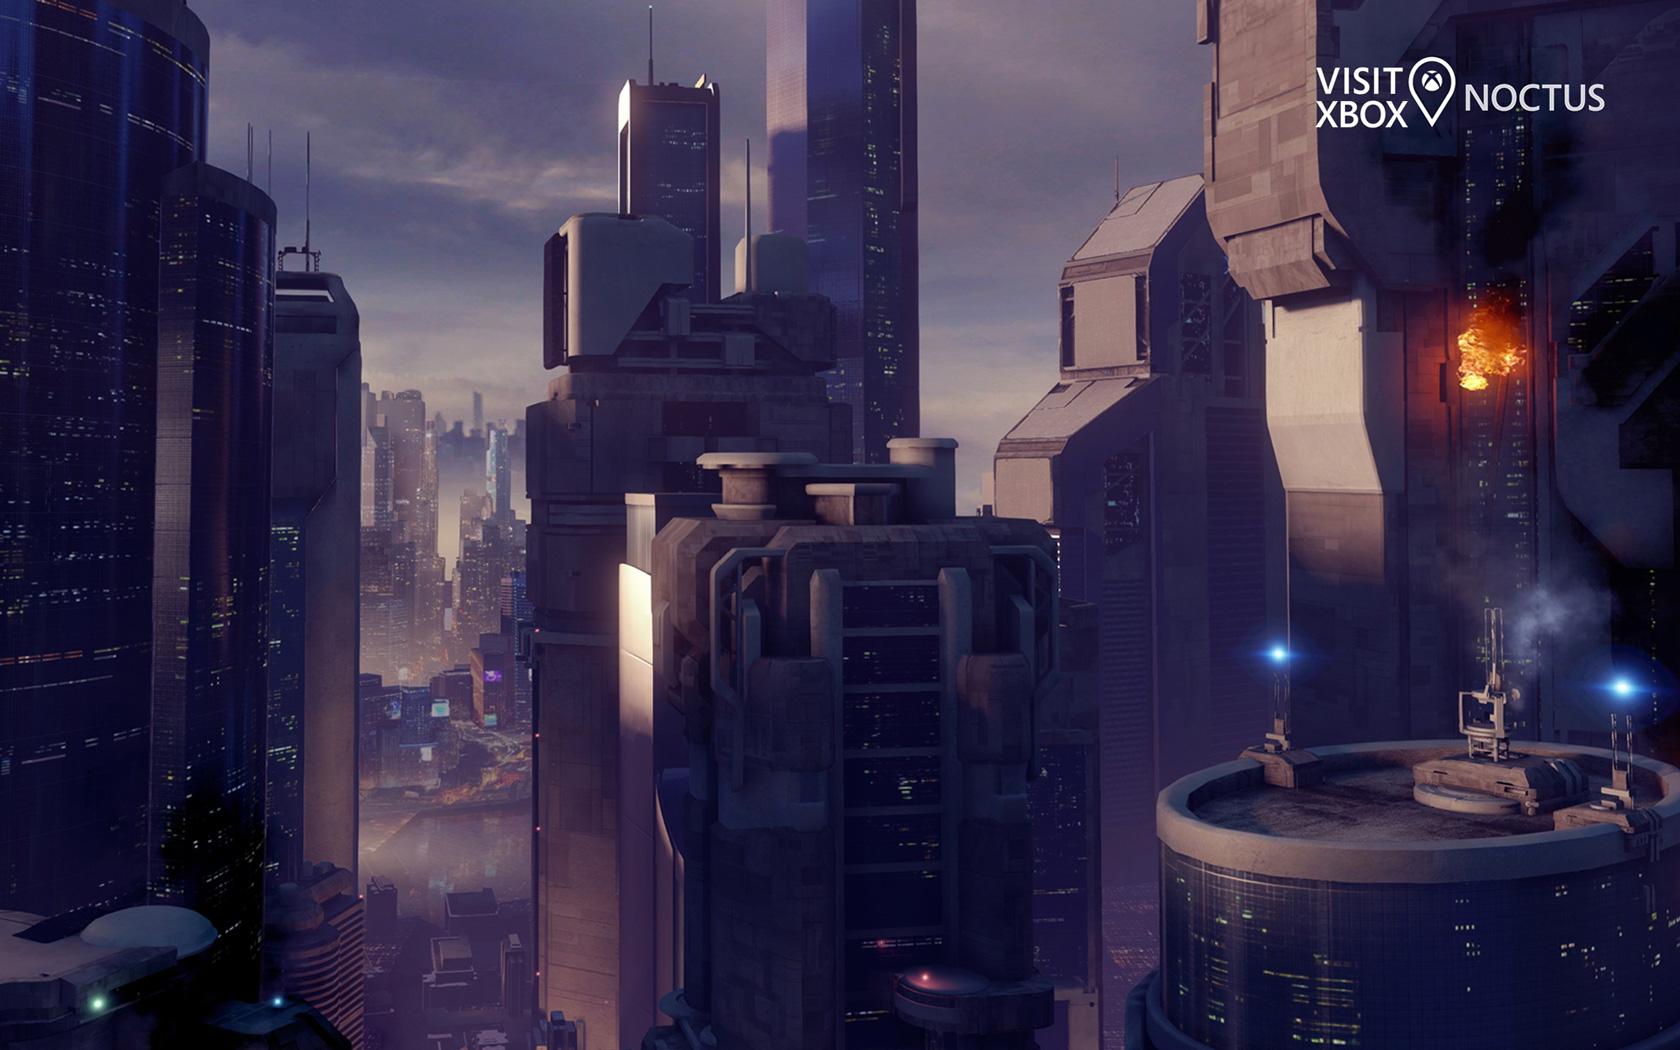 Halo 5: Guardians Wallpaper in 1680x1050